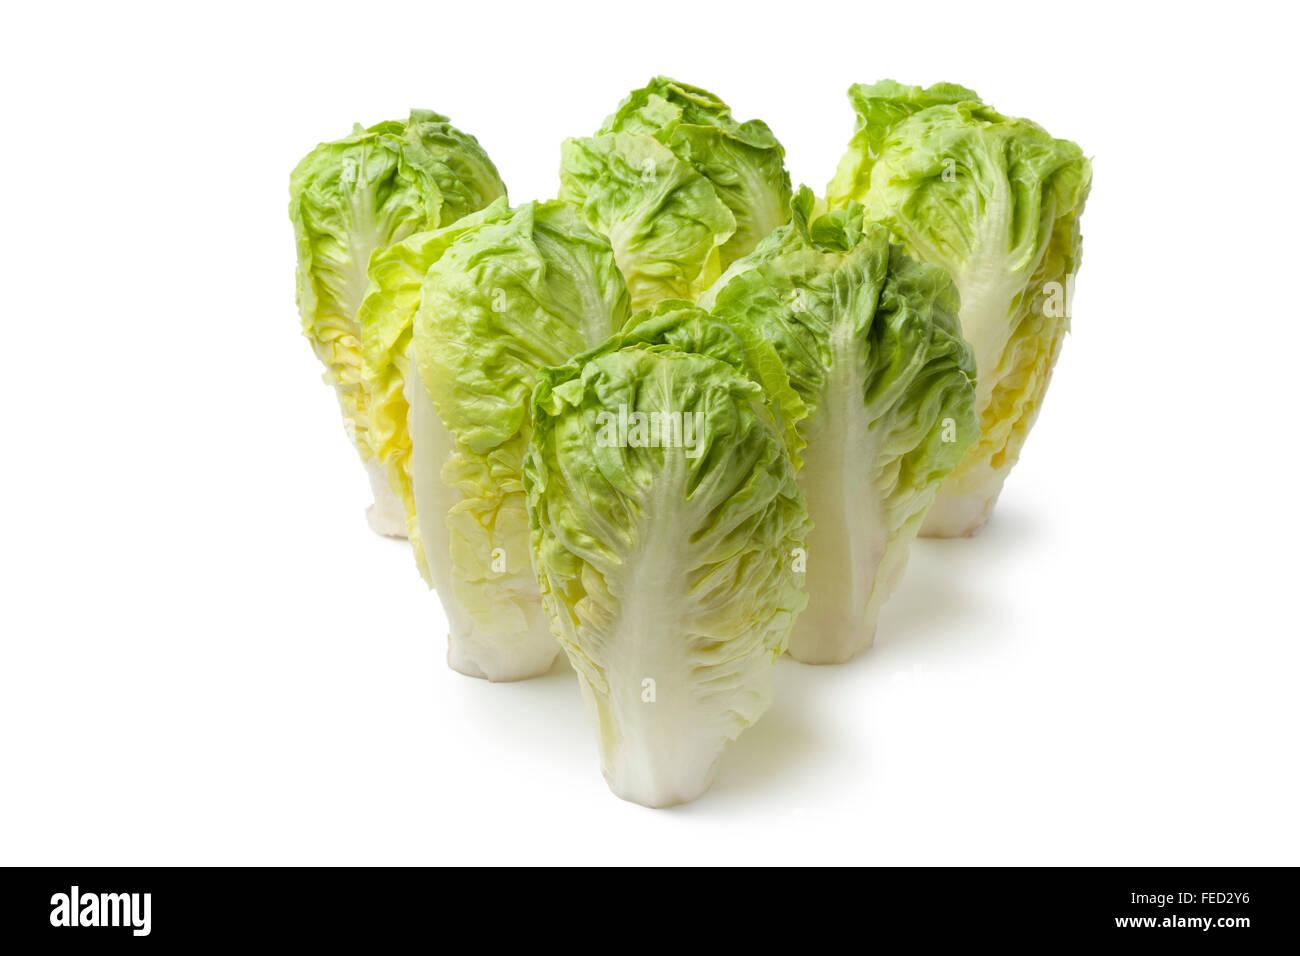 Fresh Baby gem lettuce on white background - Stock Image